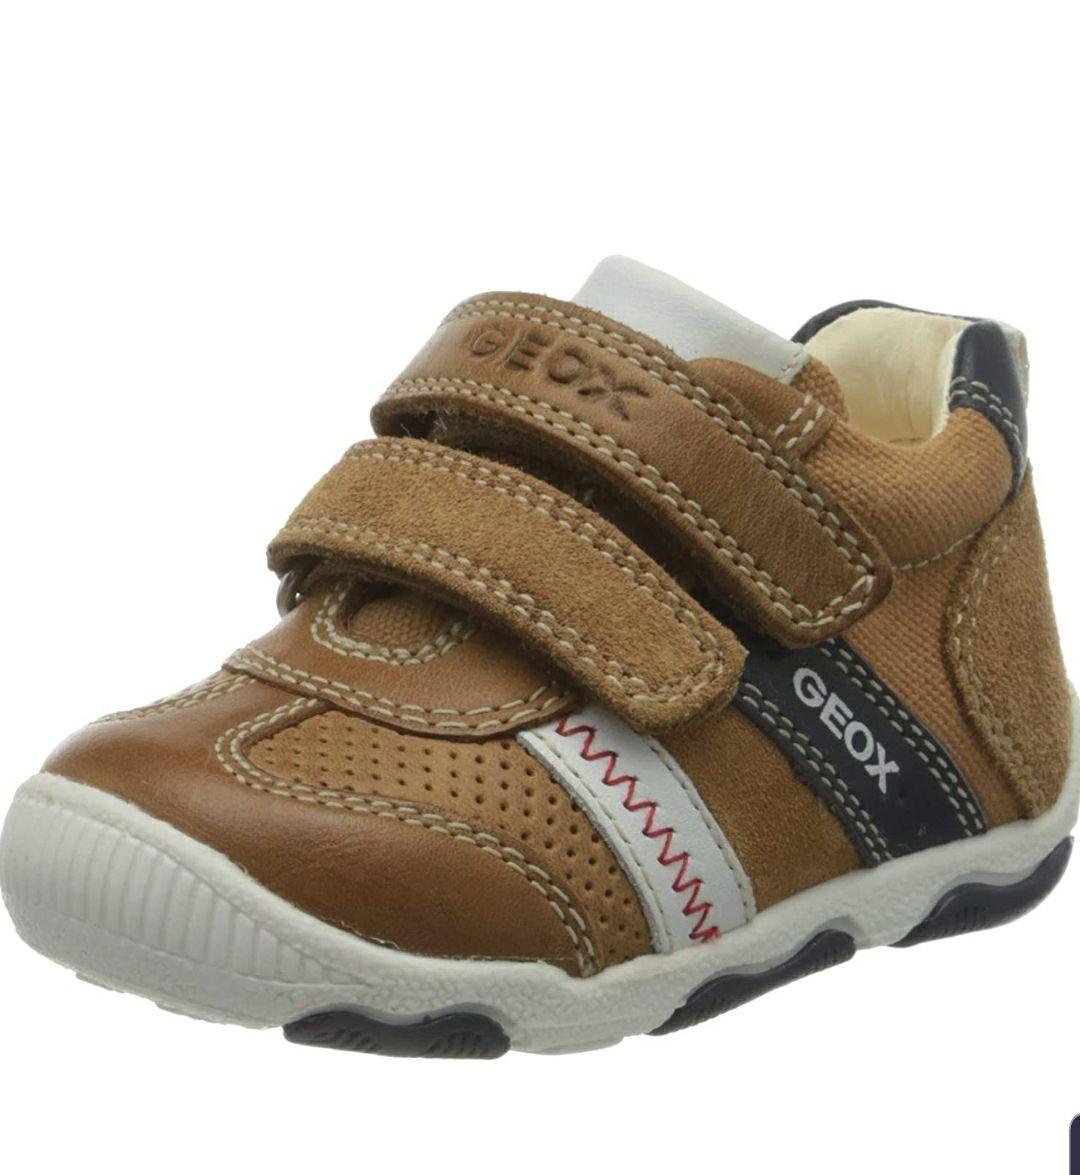 Zapatos geox niño talla 18